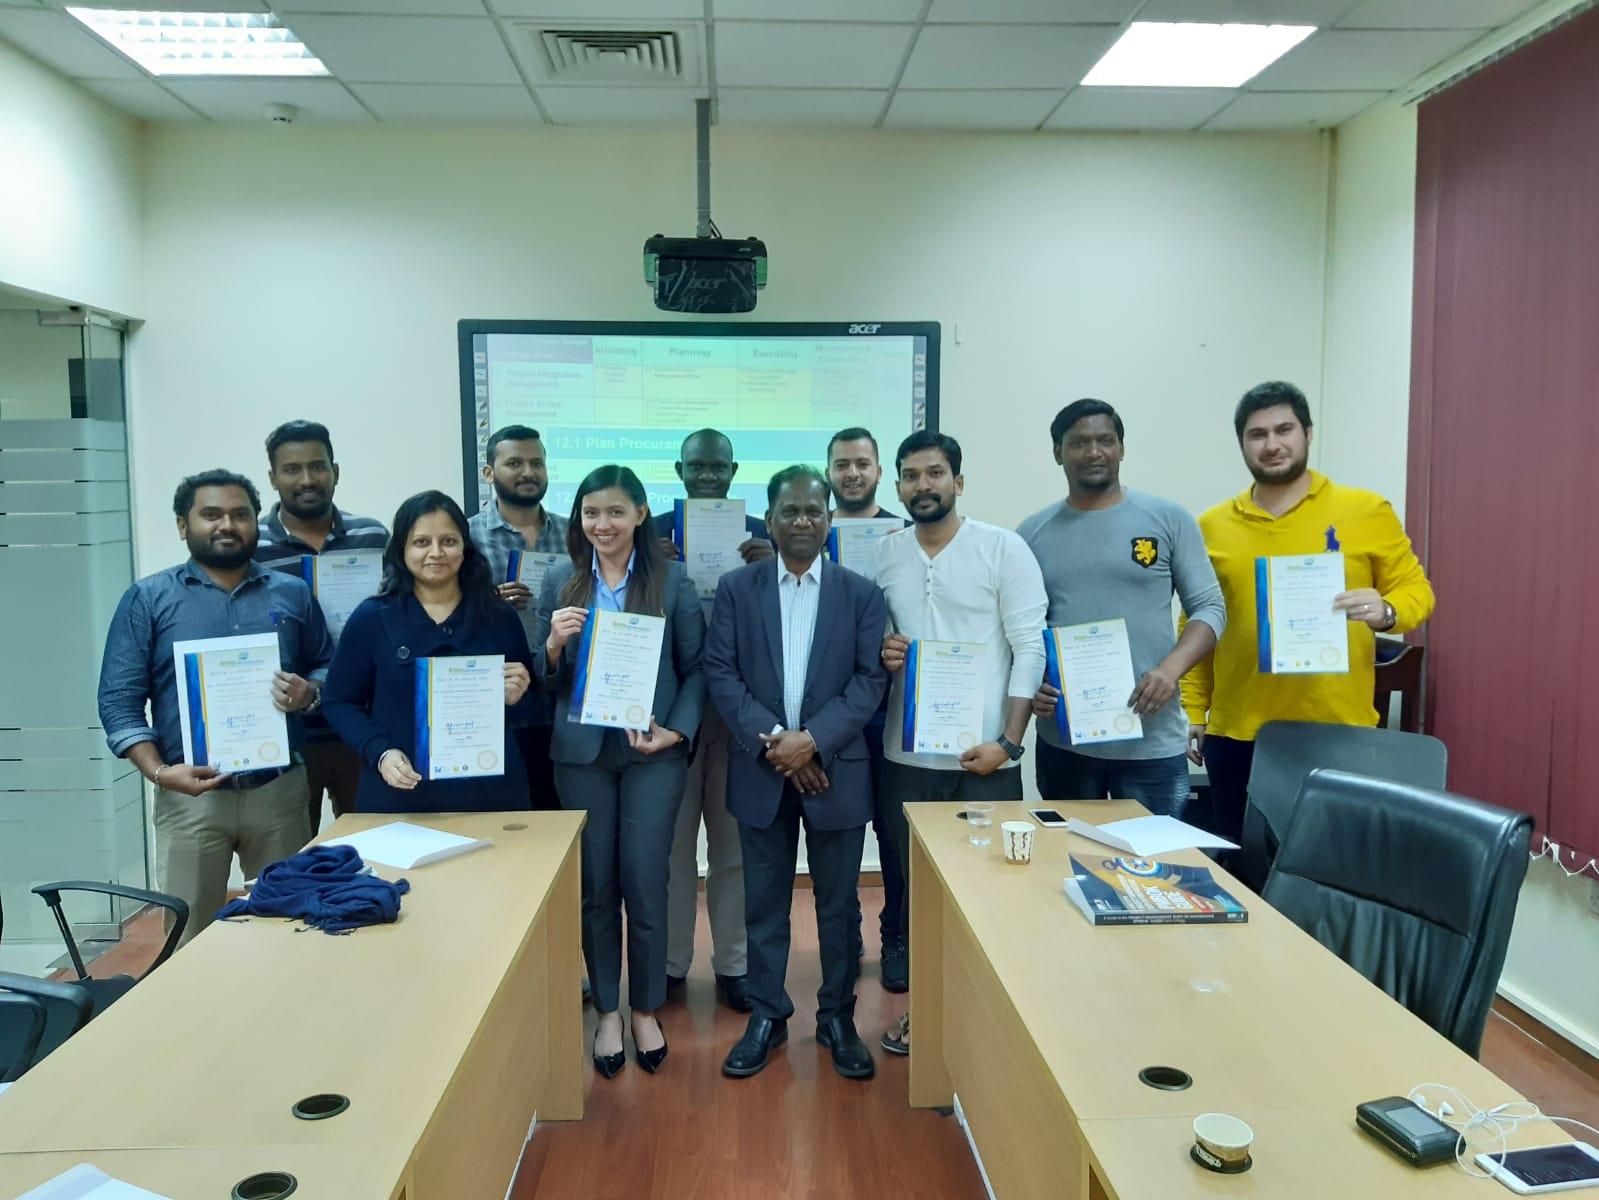 pmp certification training qatar project management courses in qatar pmp courses in qatar best pmp training in Qatar